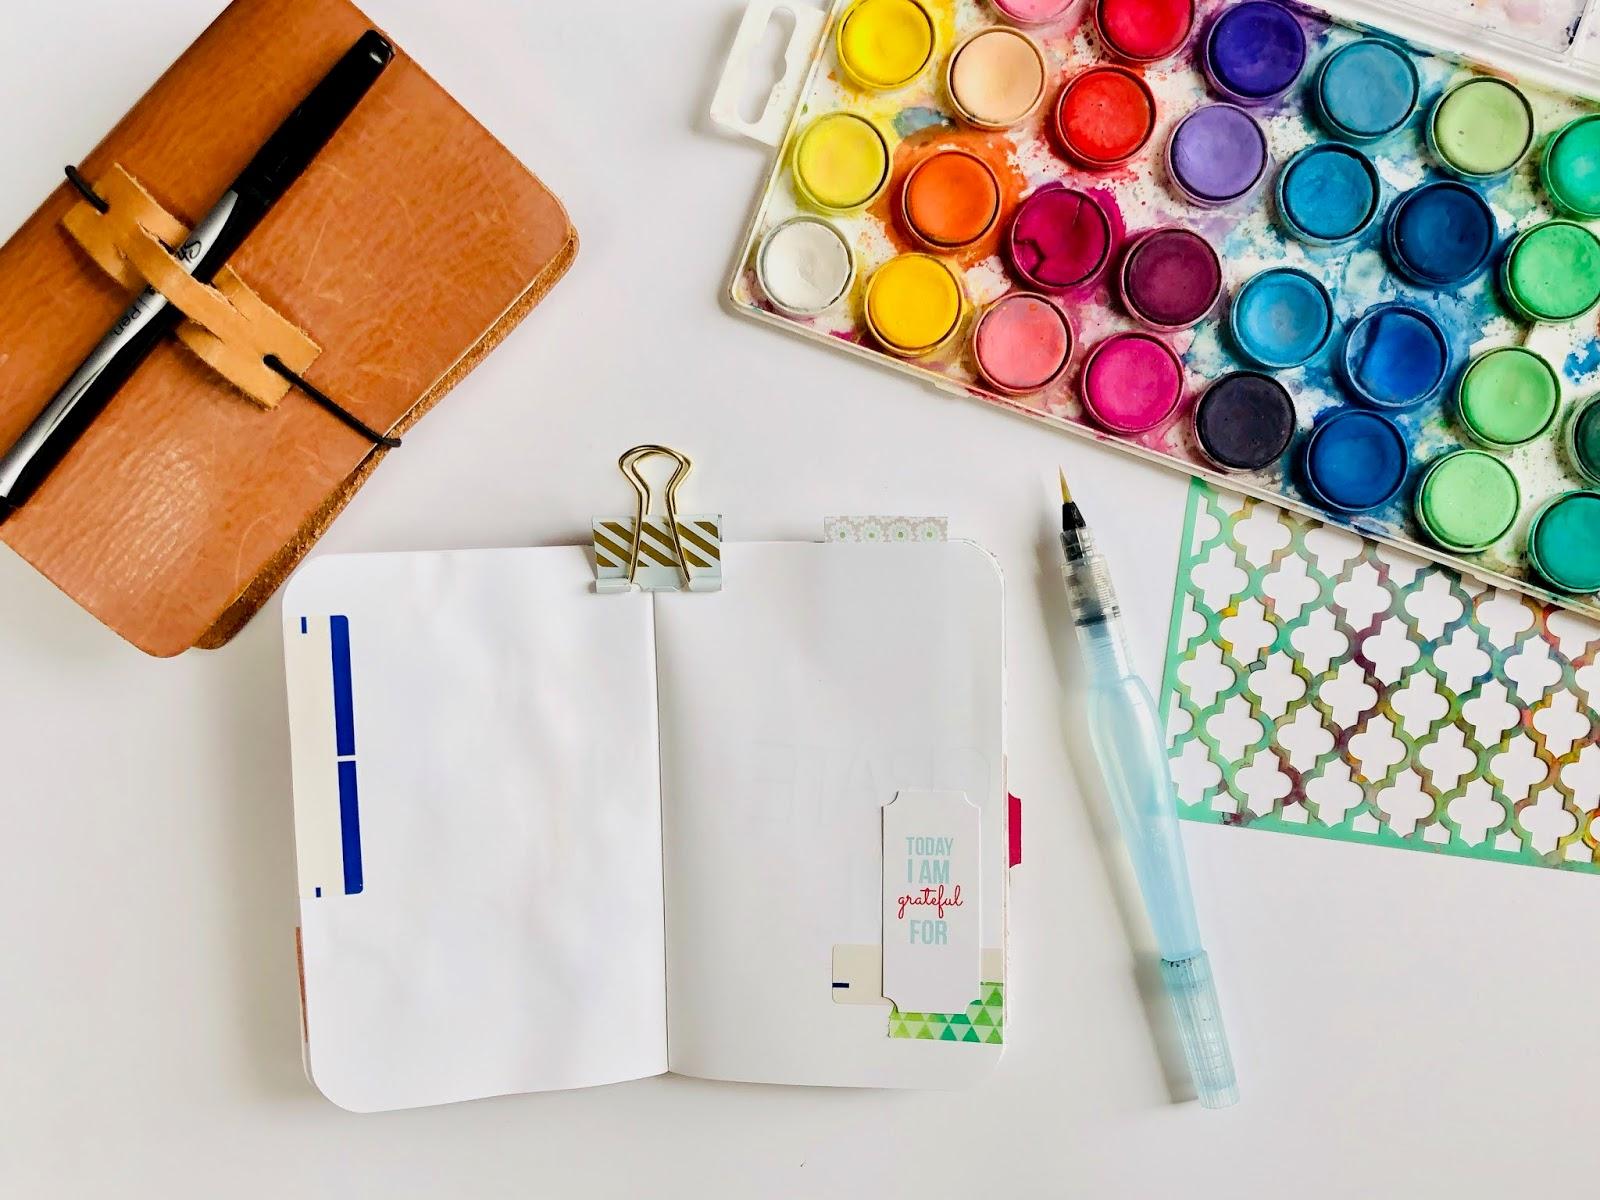 #Travelers Notebook #stamping #Gratitude Journal #journaling #Midori #Planner #notebook #thankfulness #gratitude #grateful #art journal #art journaling